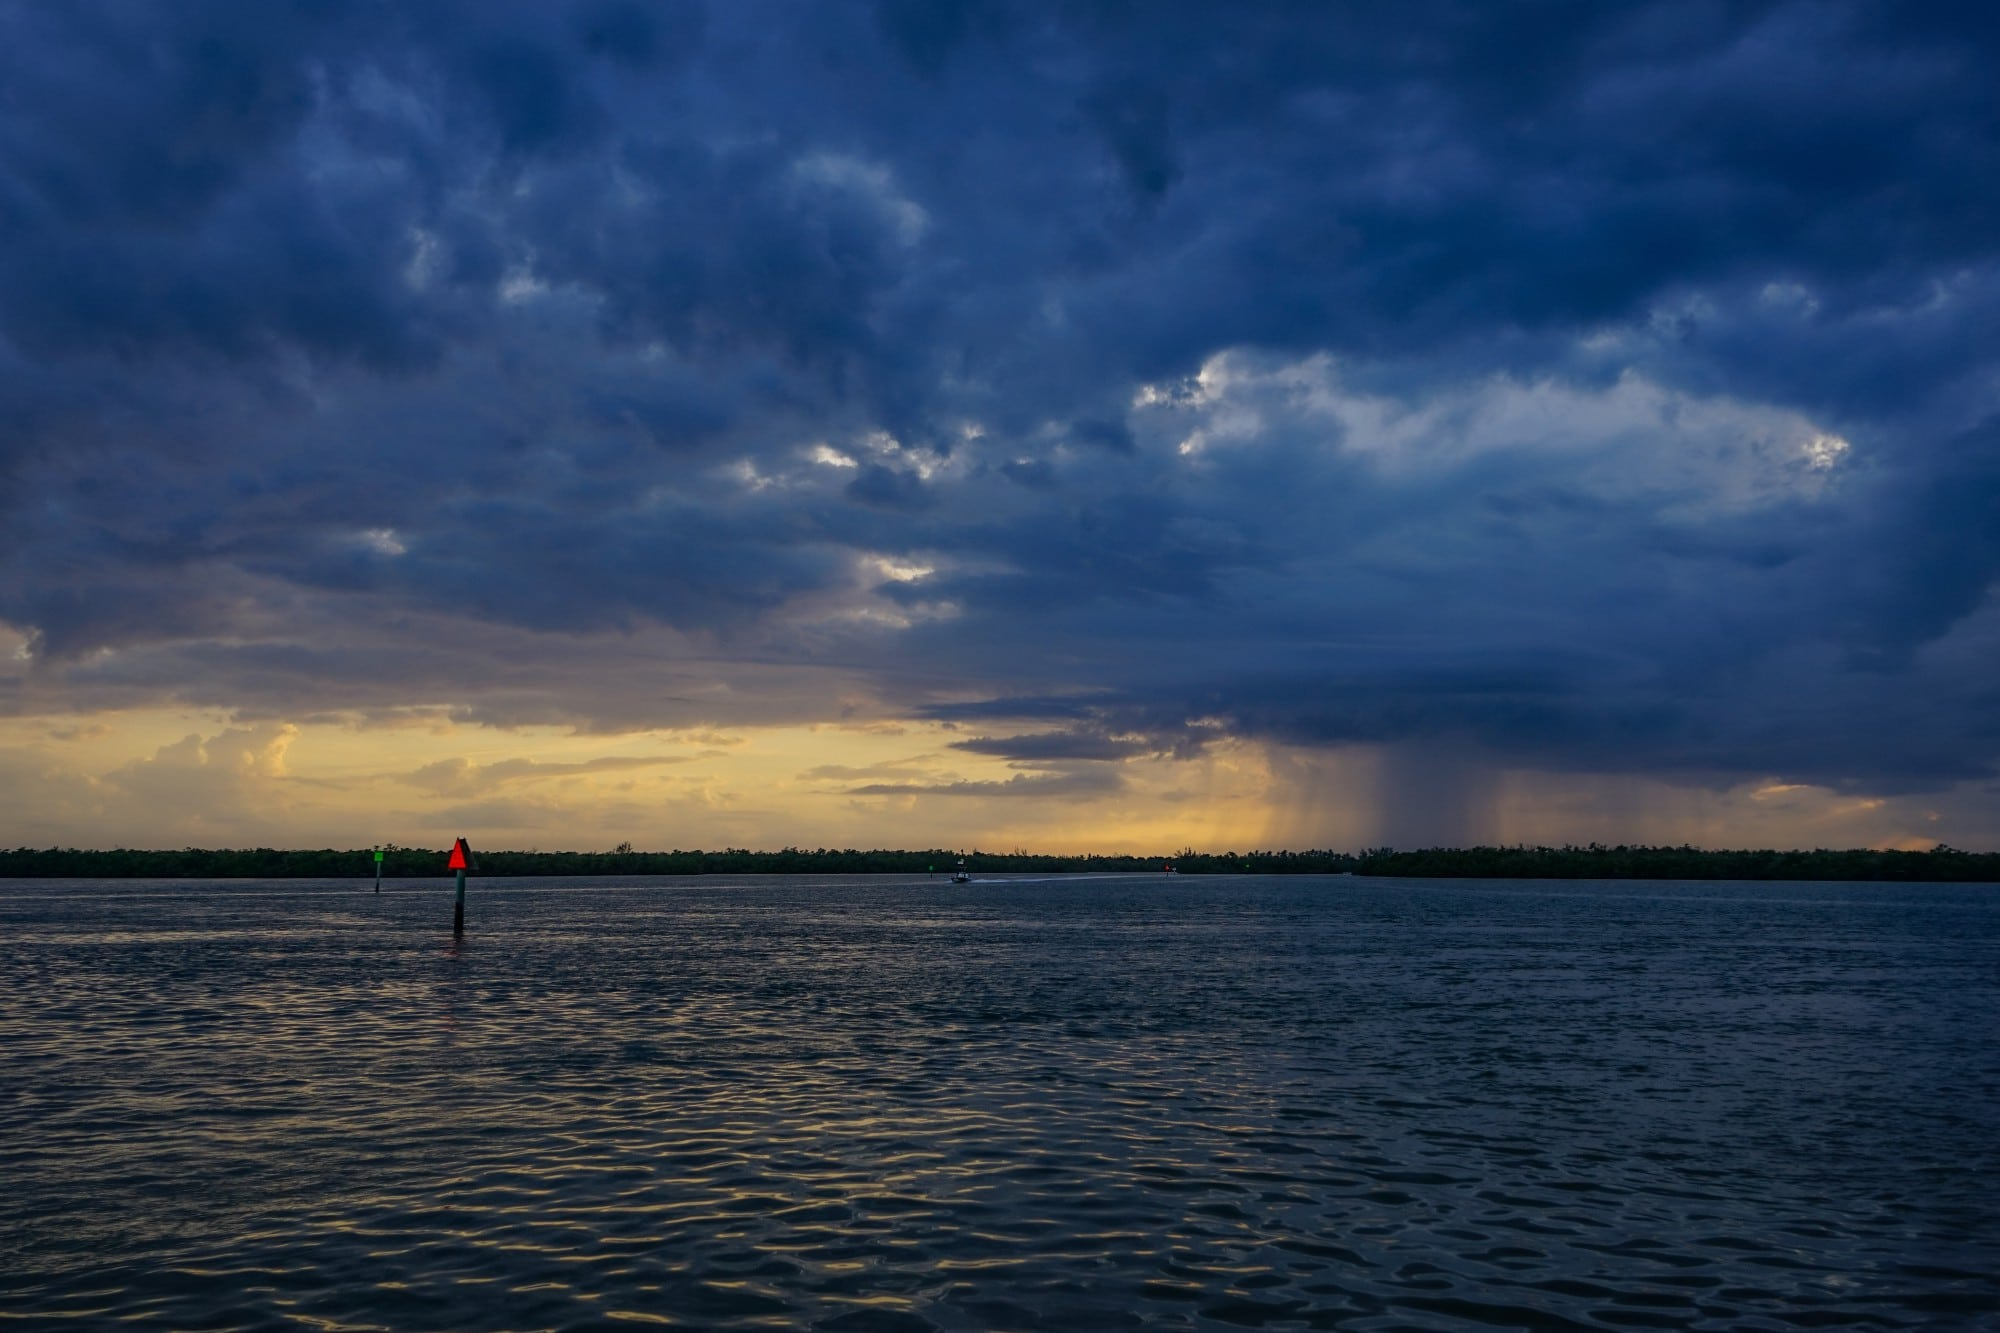 Rain over the Gulf of Mexico